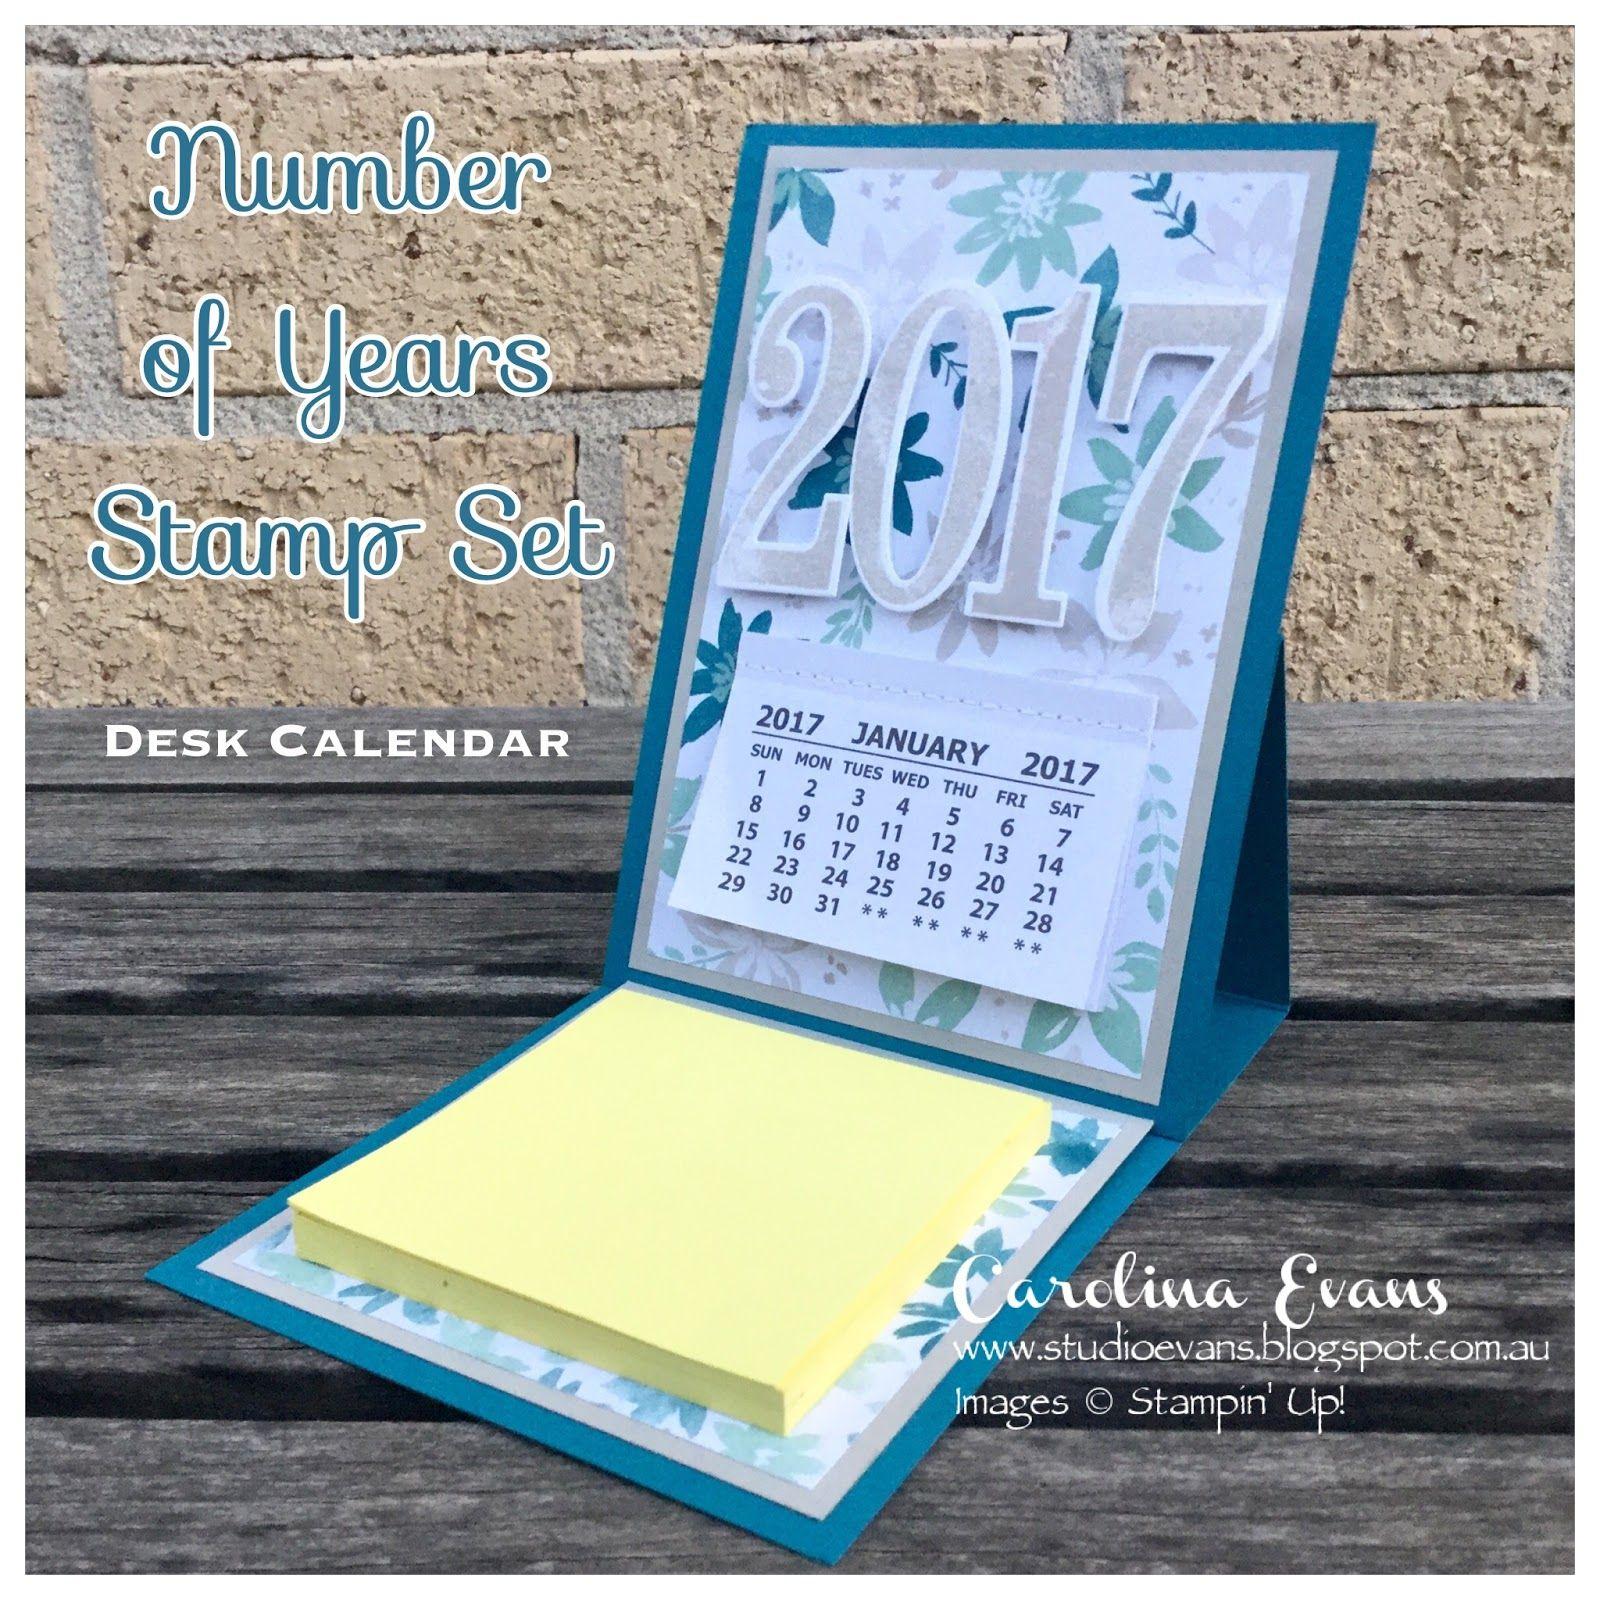 Stampin Up Calendar Ideas : Carolina evans stampin up  number of years